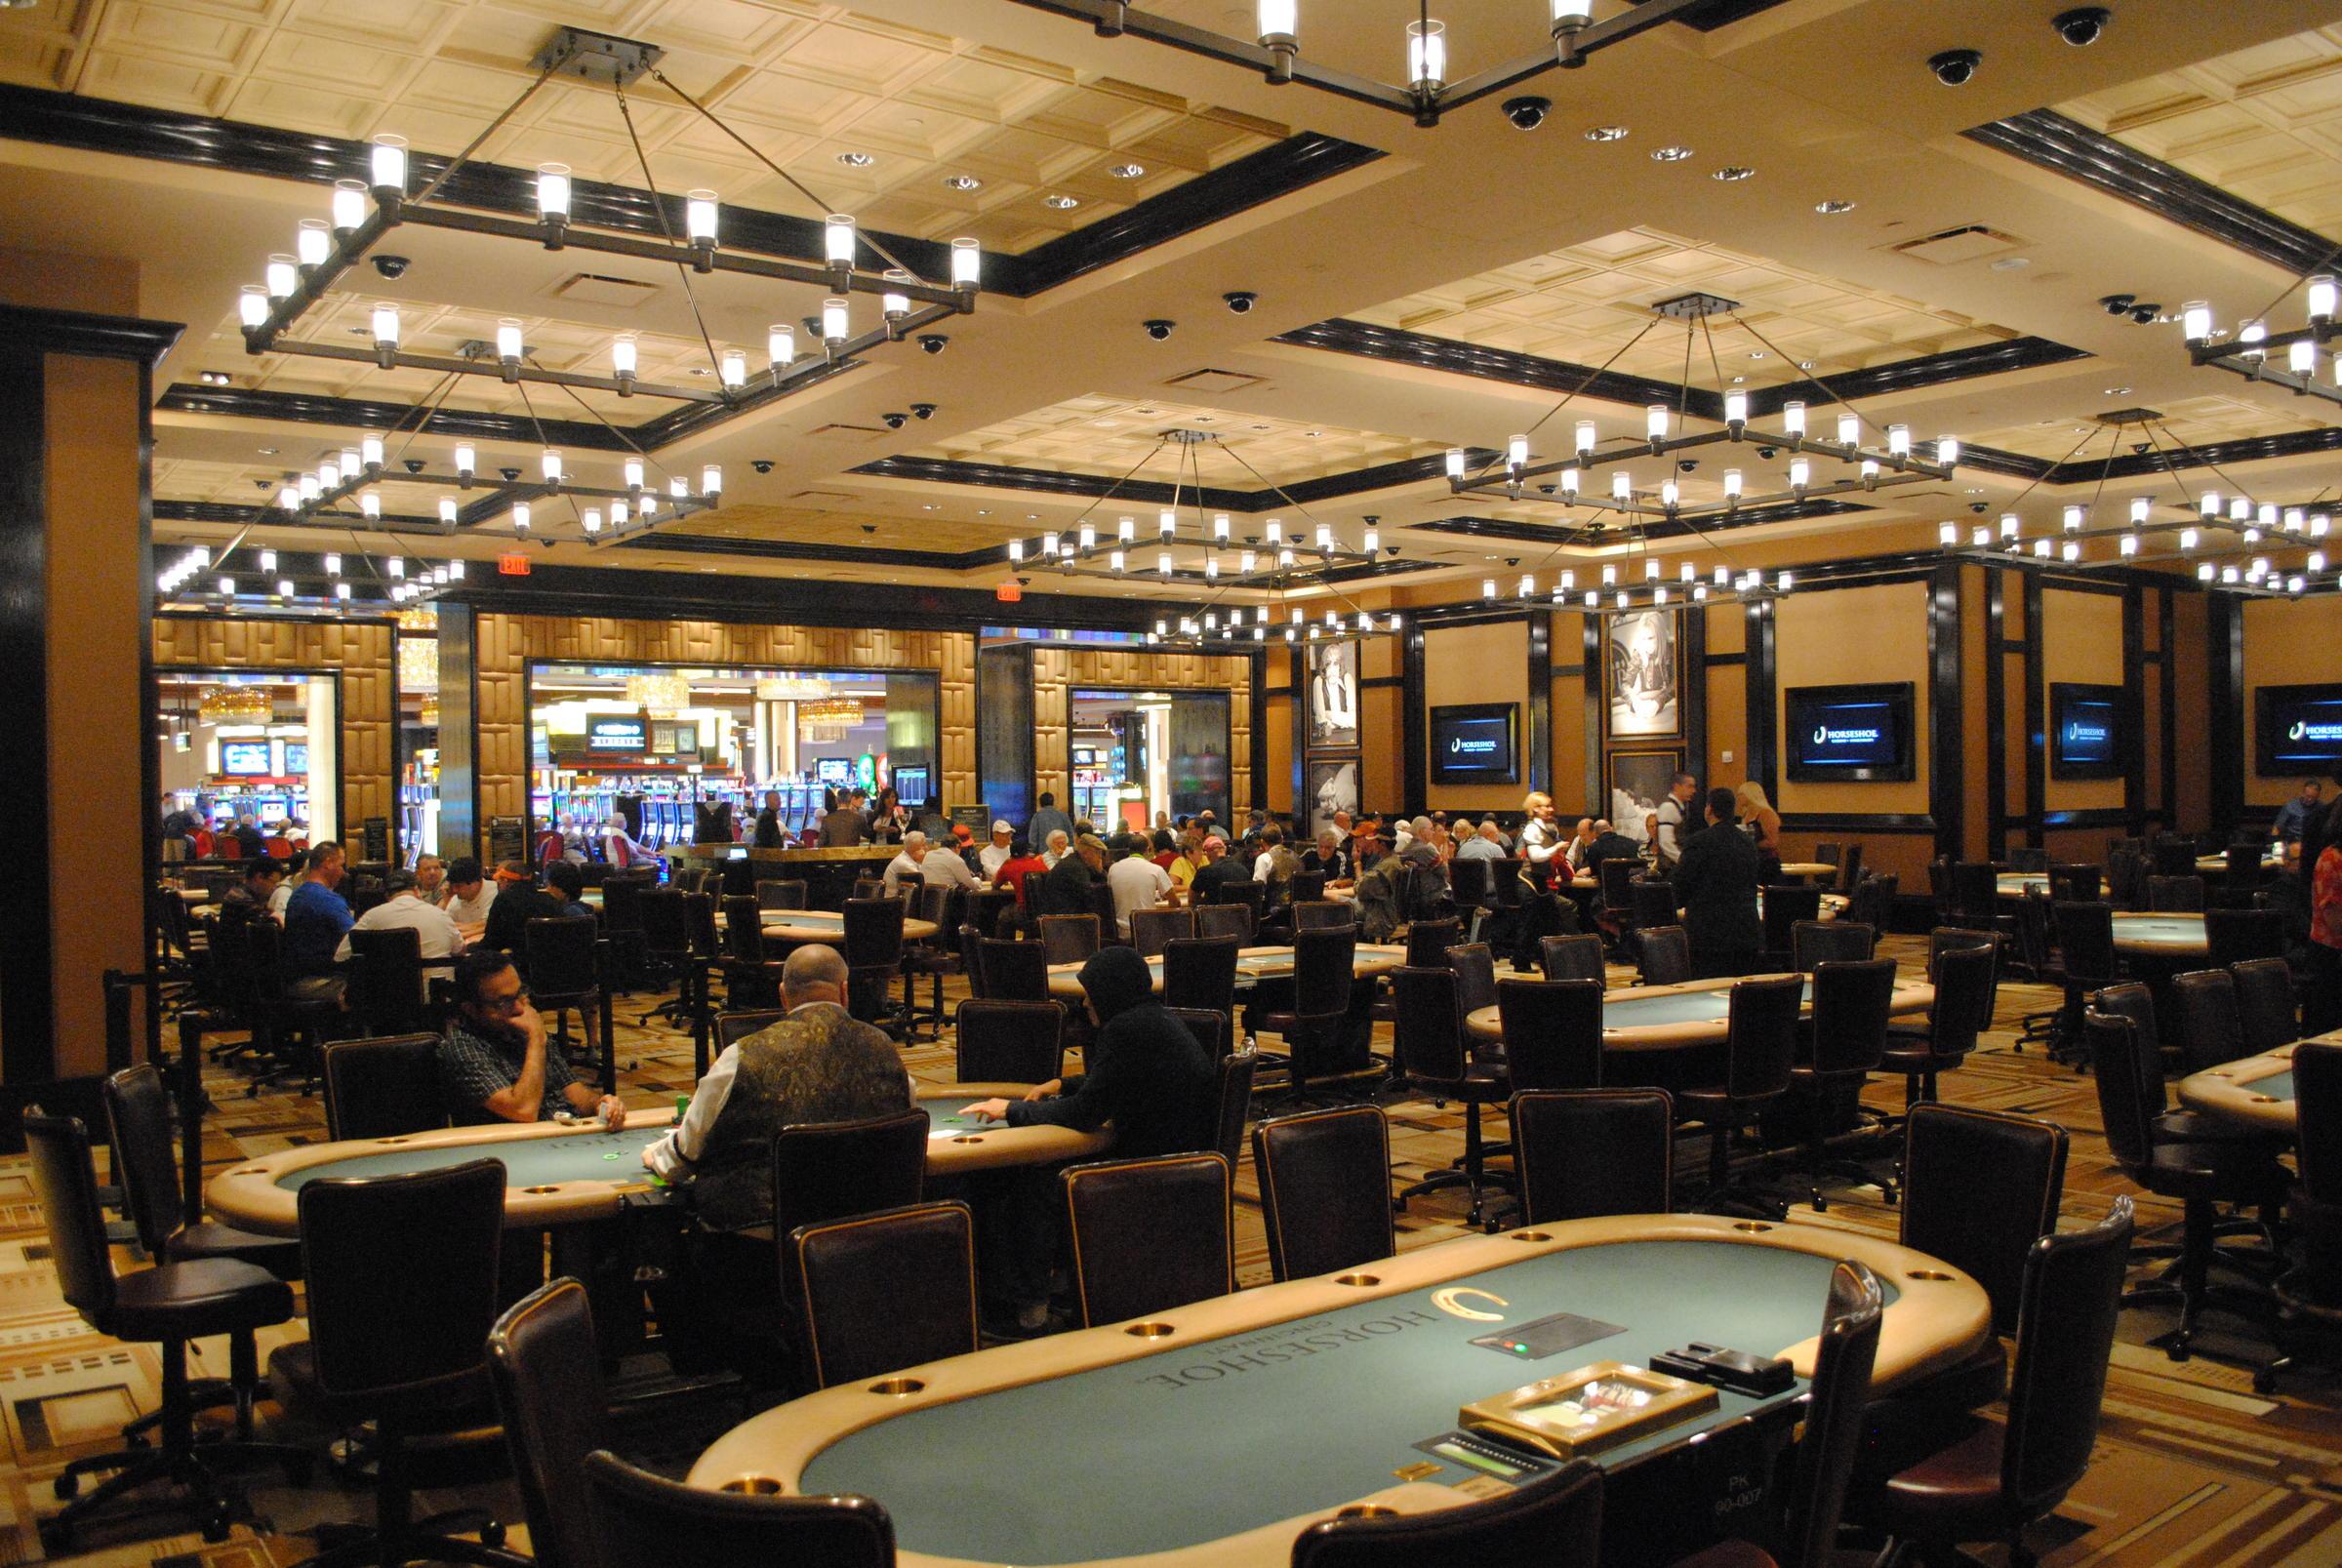 Odds of winning 3 blackjack hands in a row